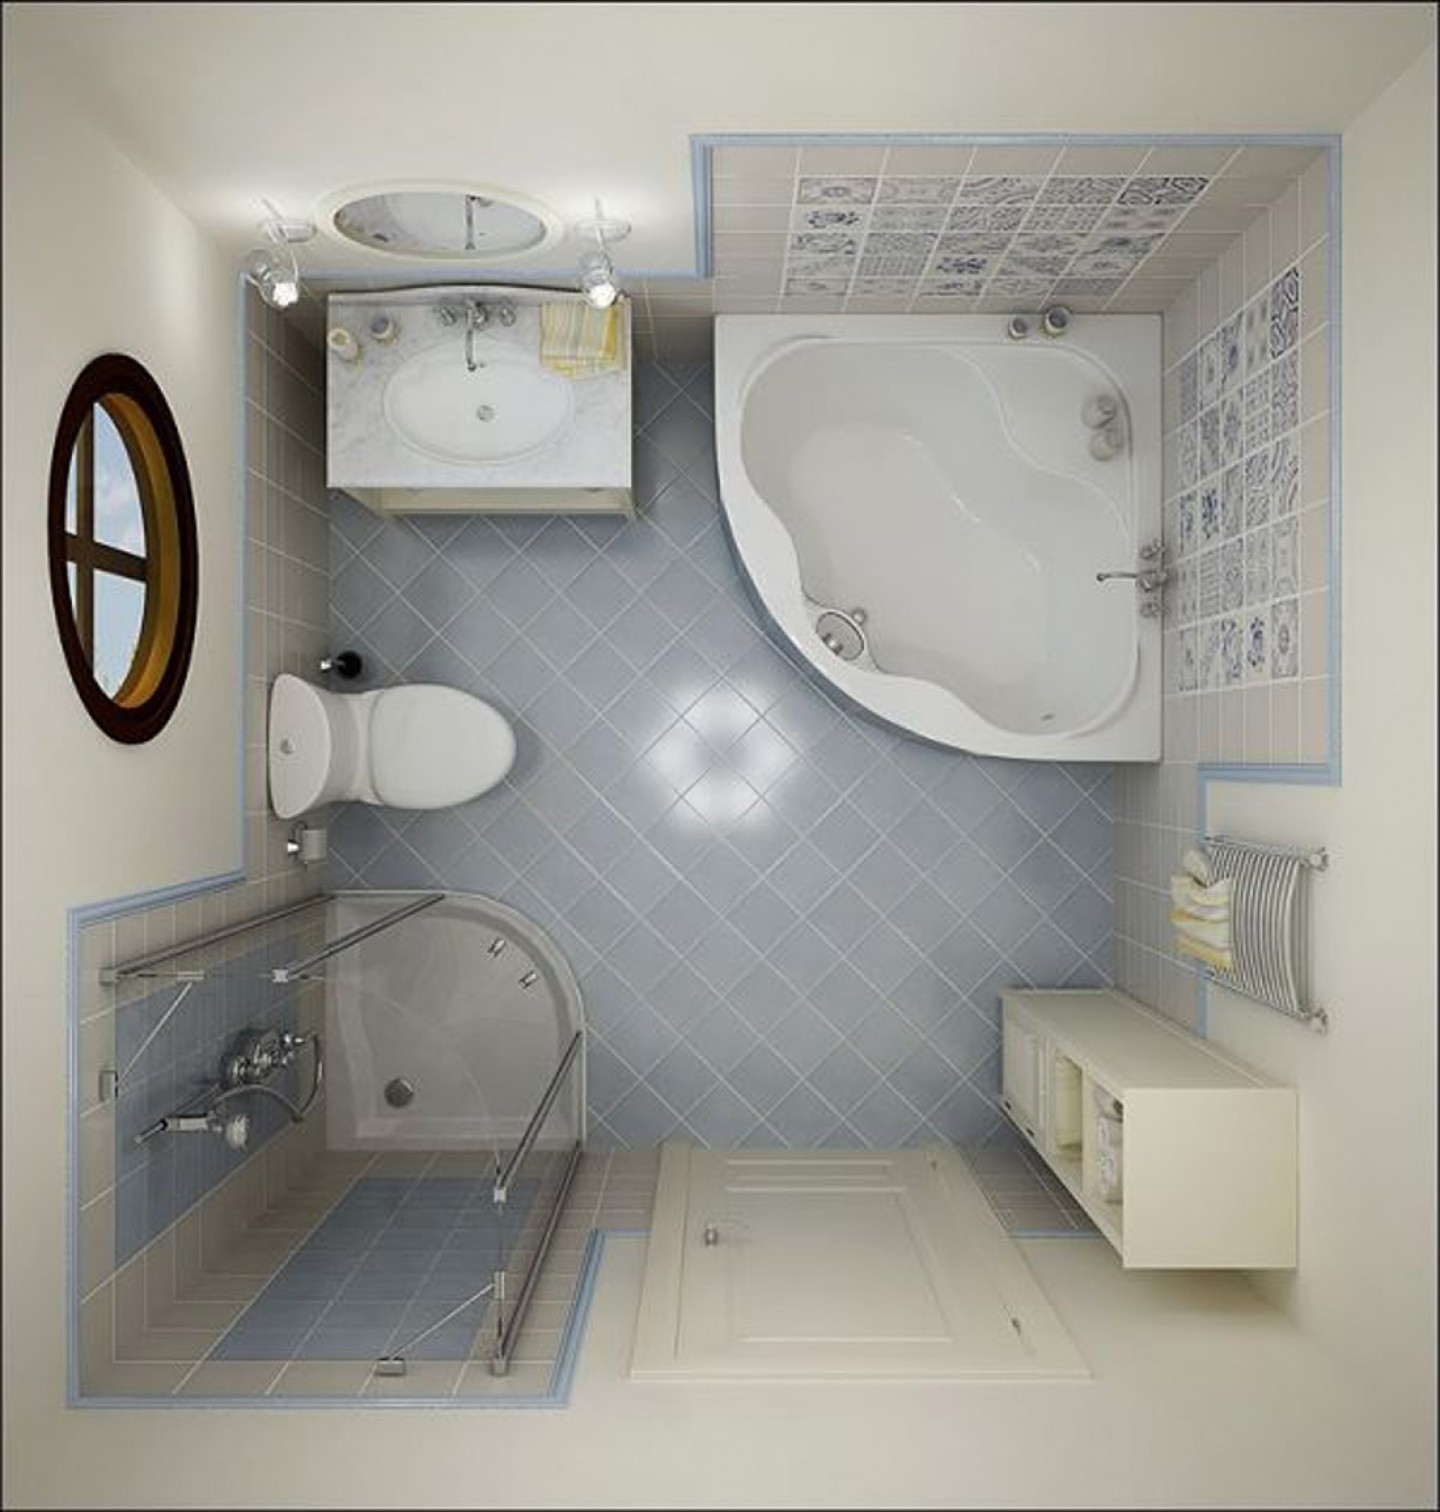 Small Shower Areas Small Bathroom Layout Idea With Corner Bathtub